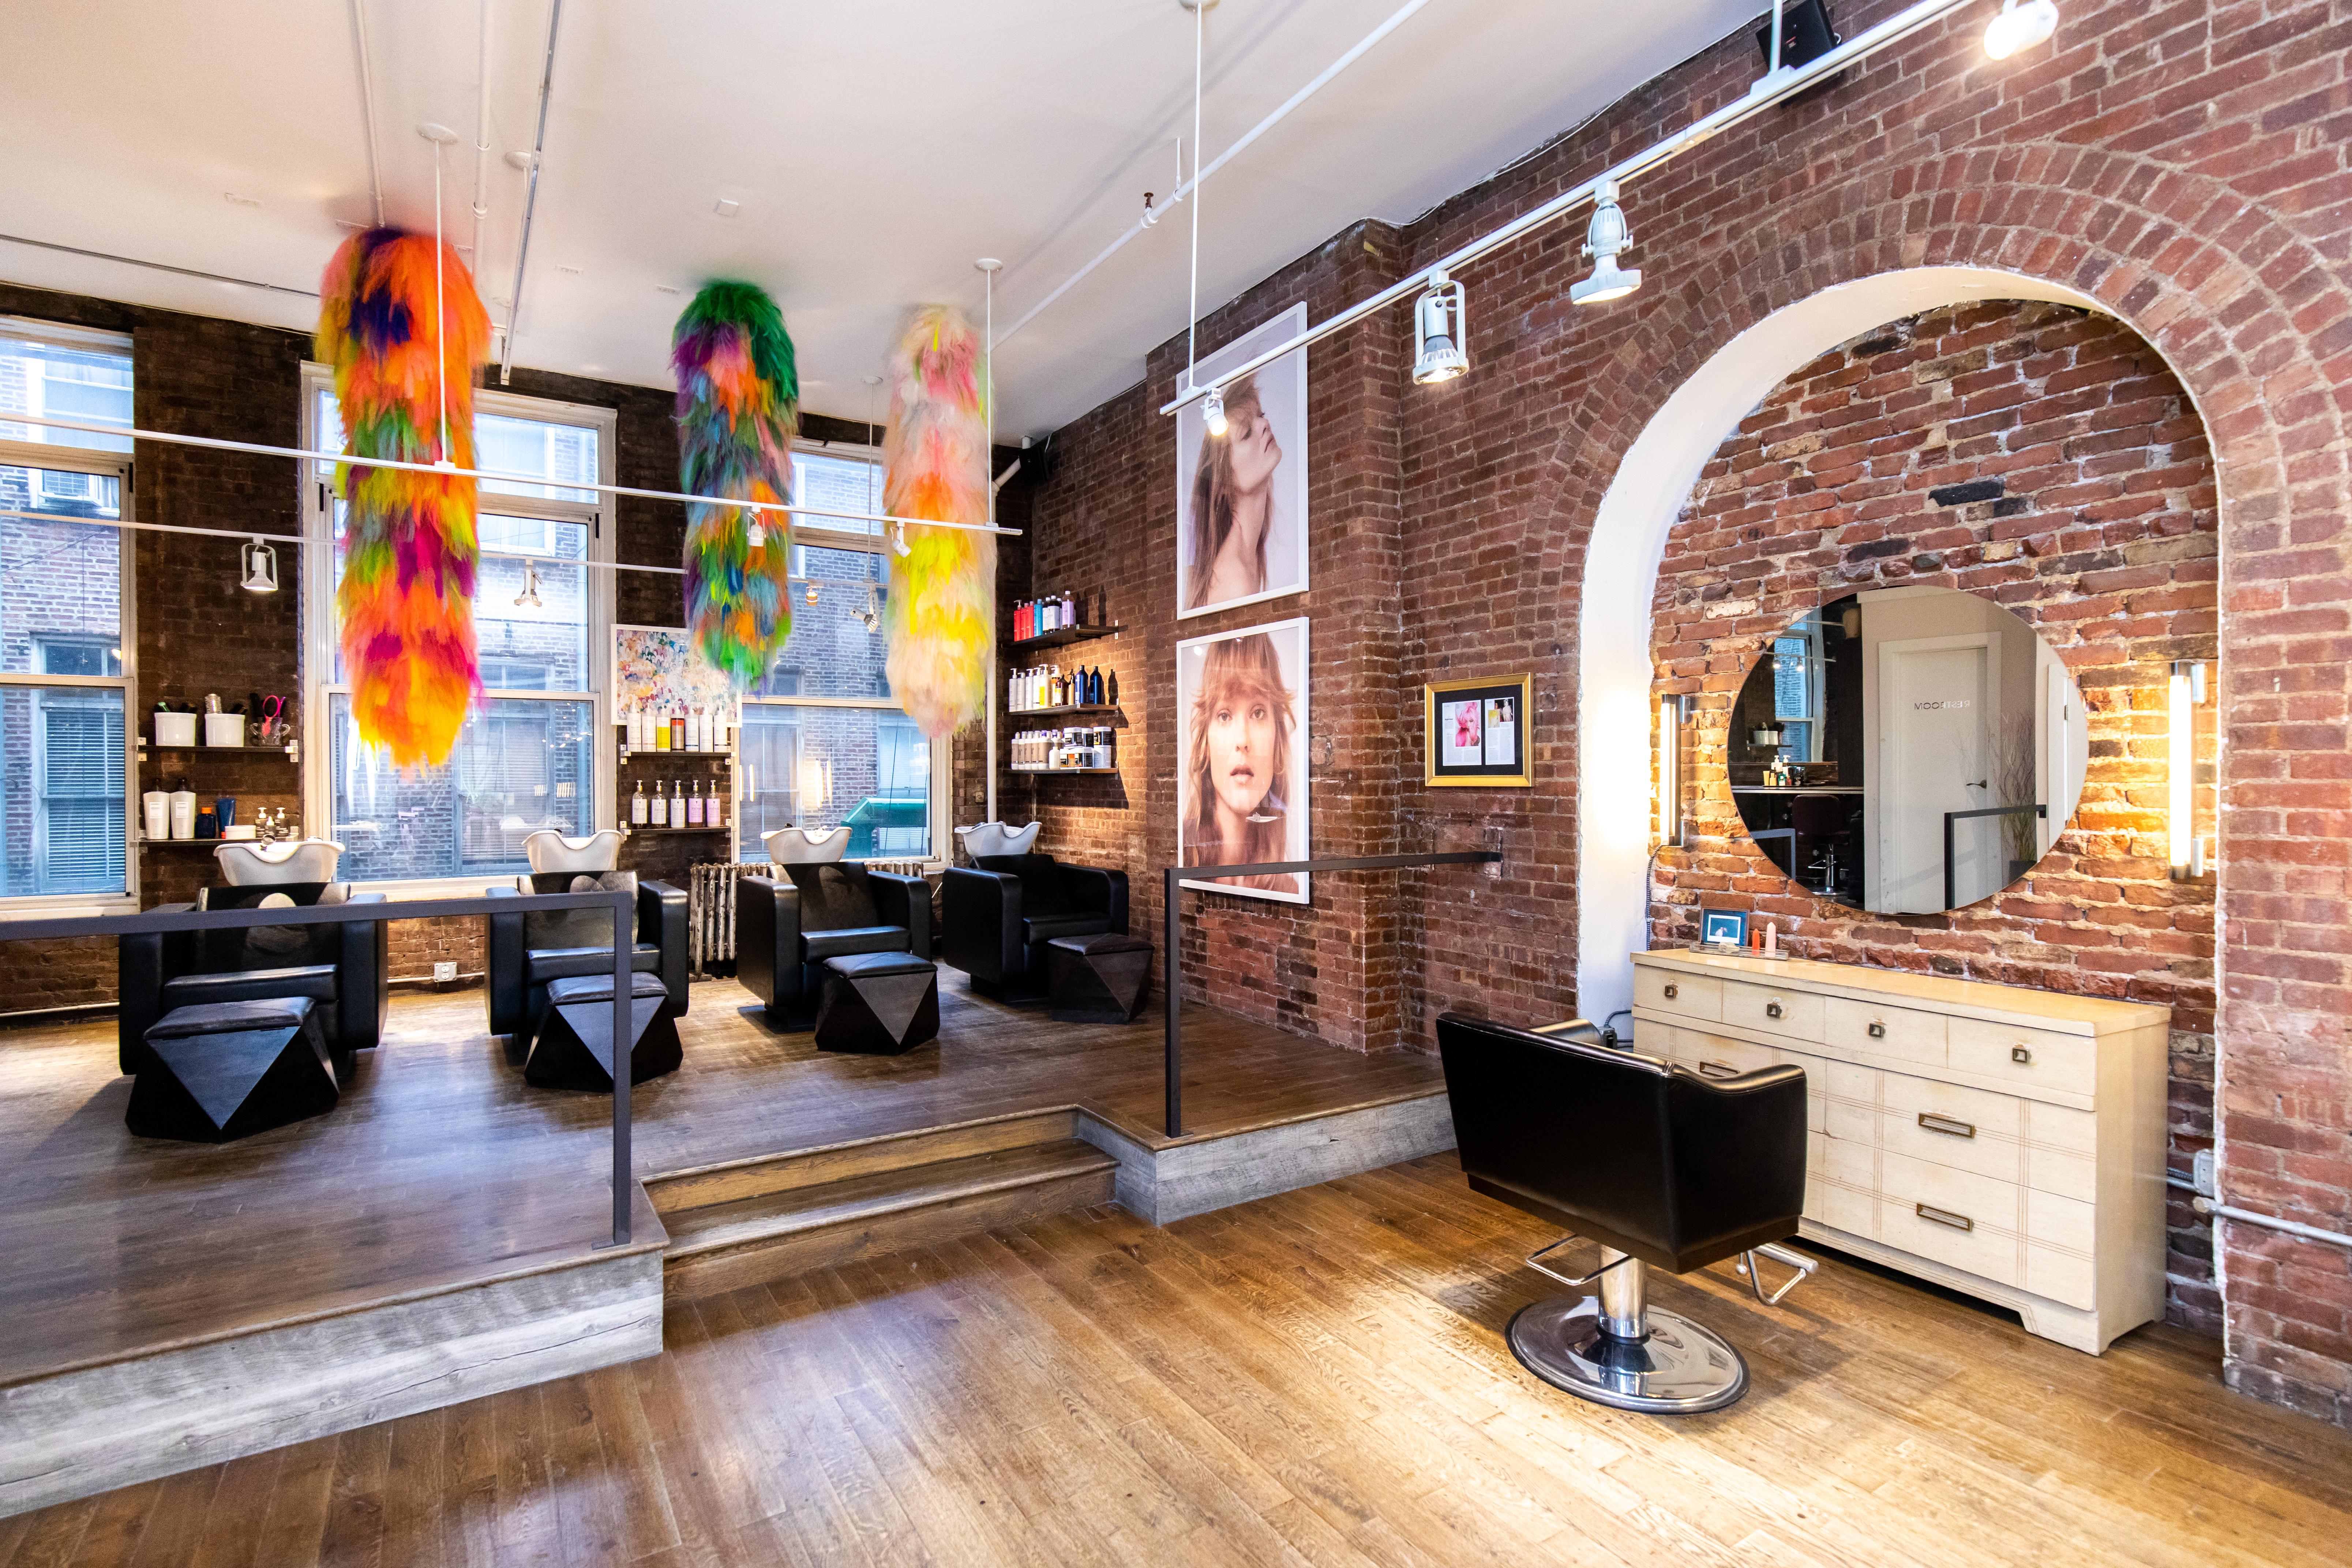 Salon Tour: Suite Caroline's Artistic Loft in the Heart of SoHo